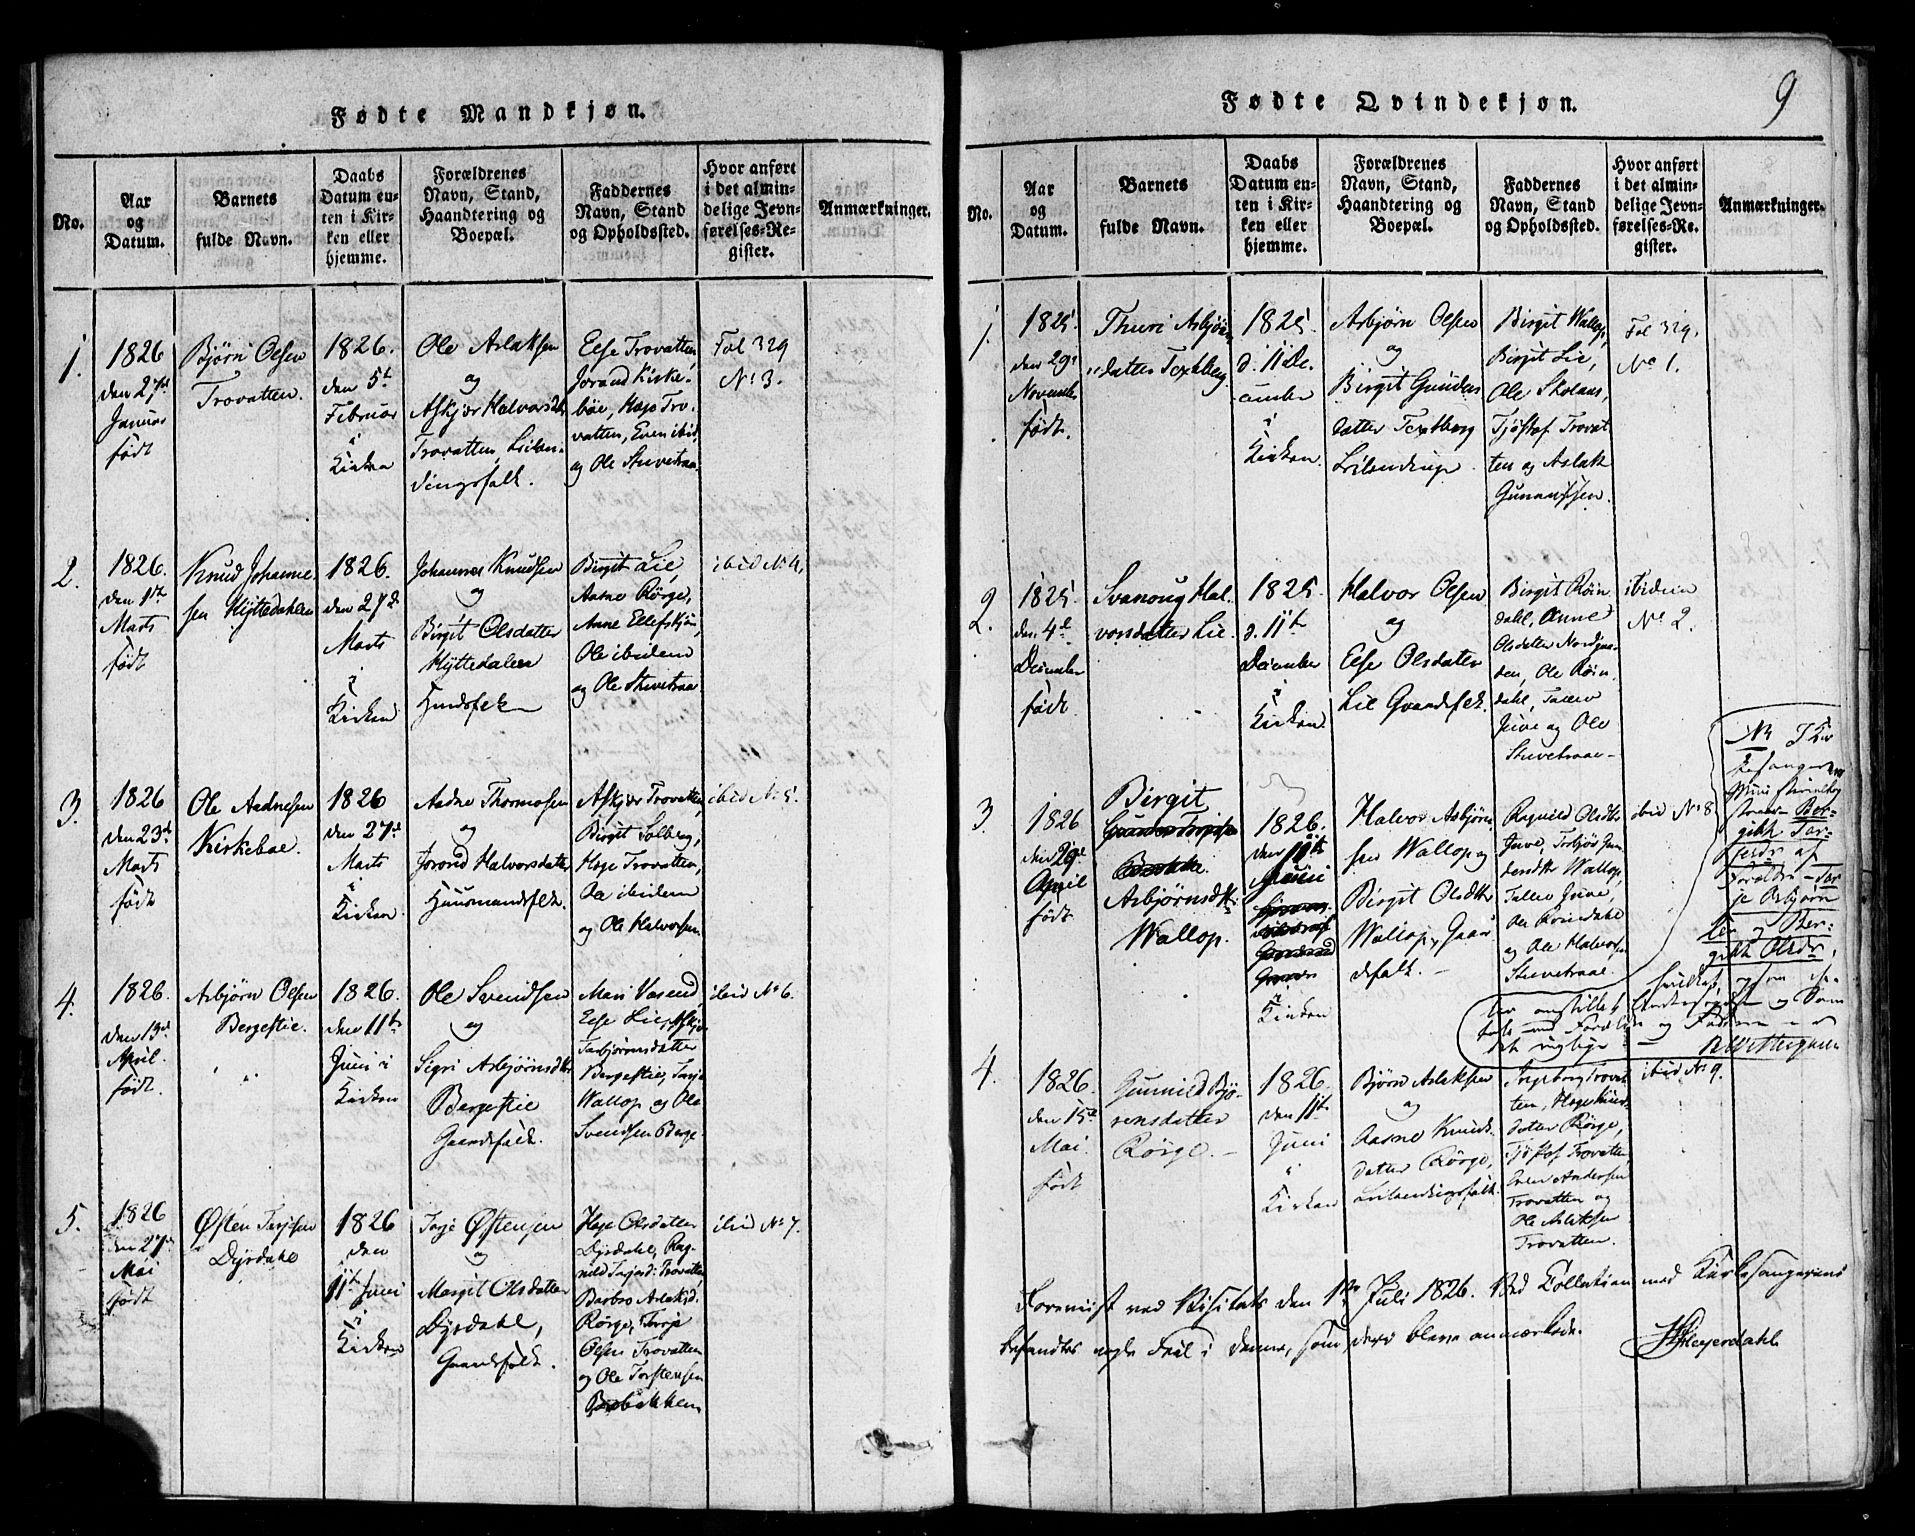 SAKO, Rauland kirkebøker, F/Fa/L0002: Ministerialbok nr. 2, 1815-1860, s. 9